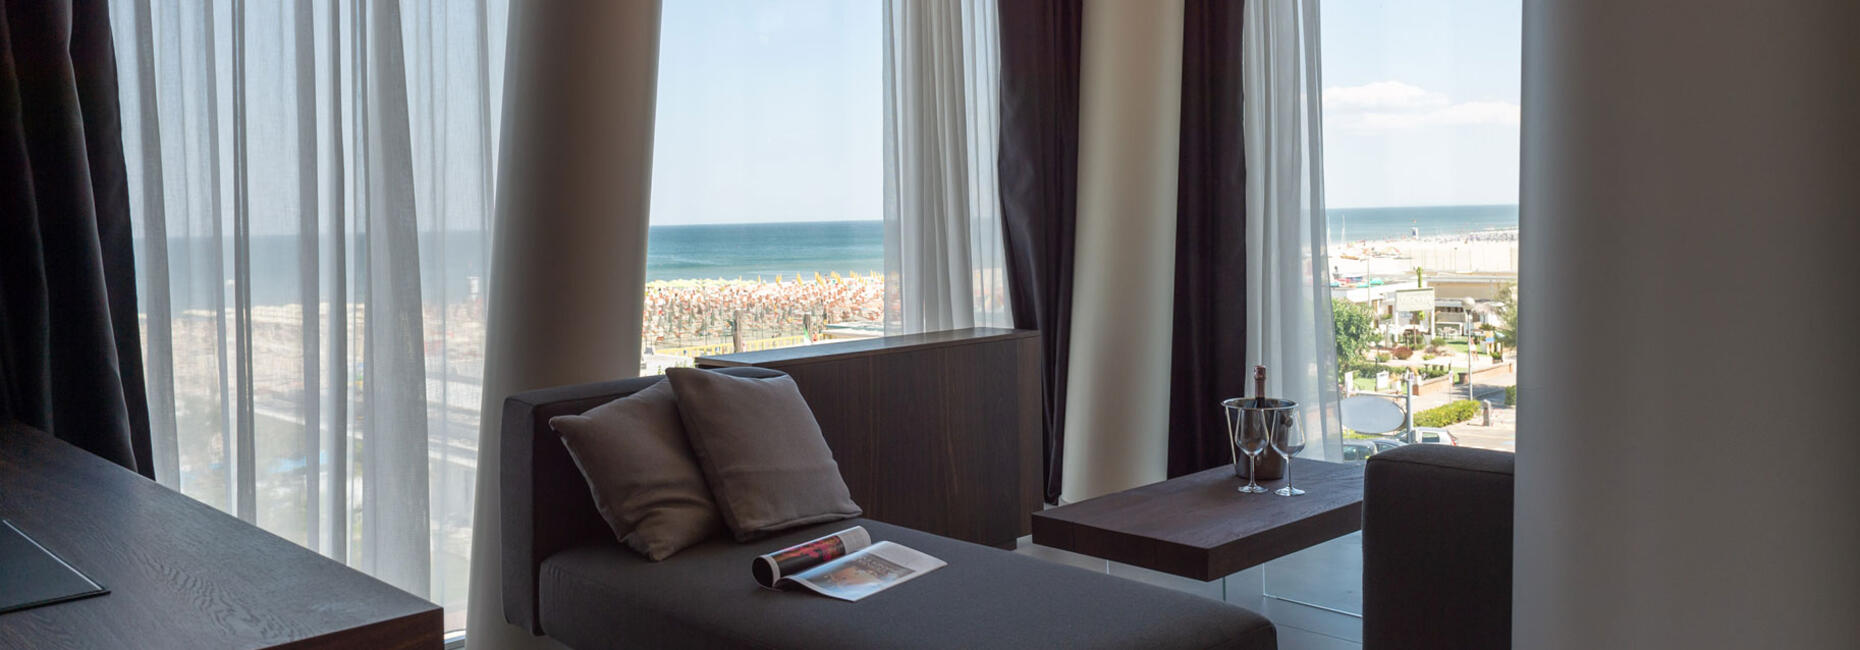 hotelcommodore it suite-vista-mare-cervia 011